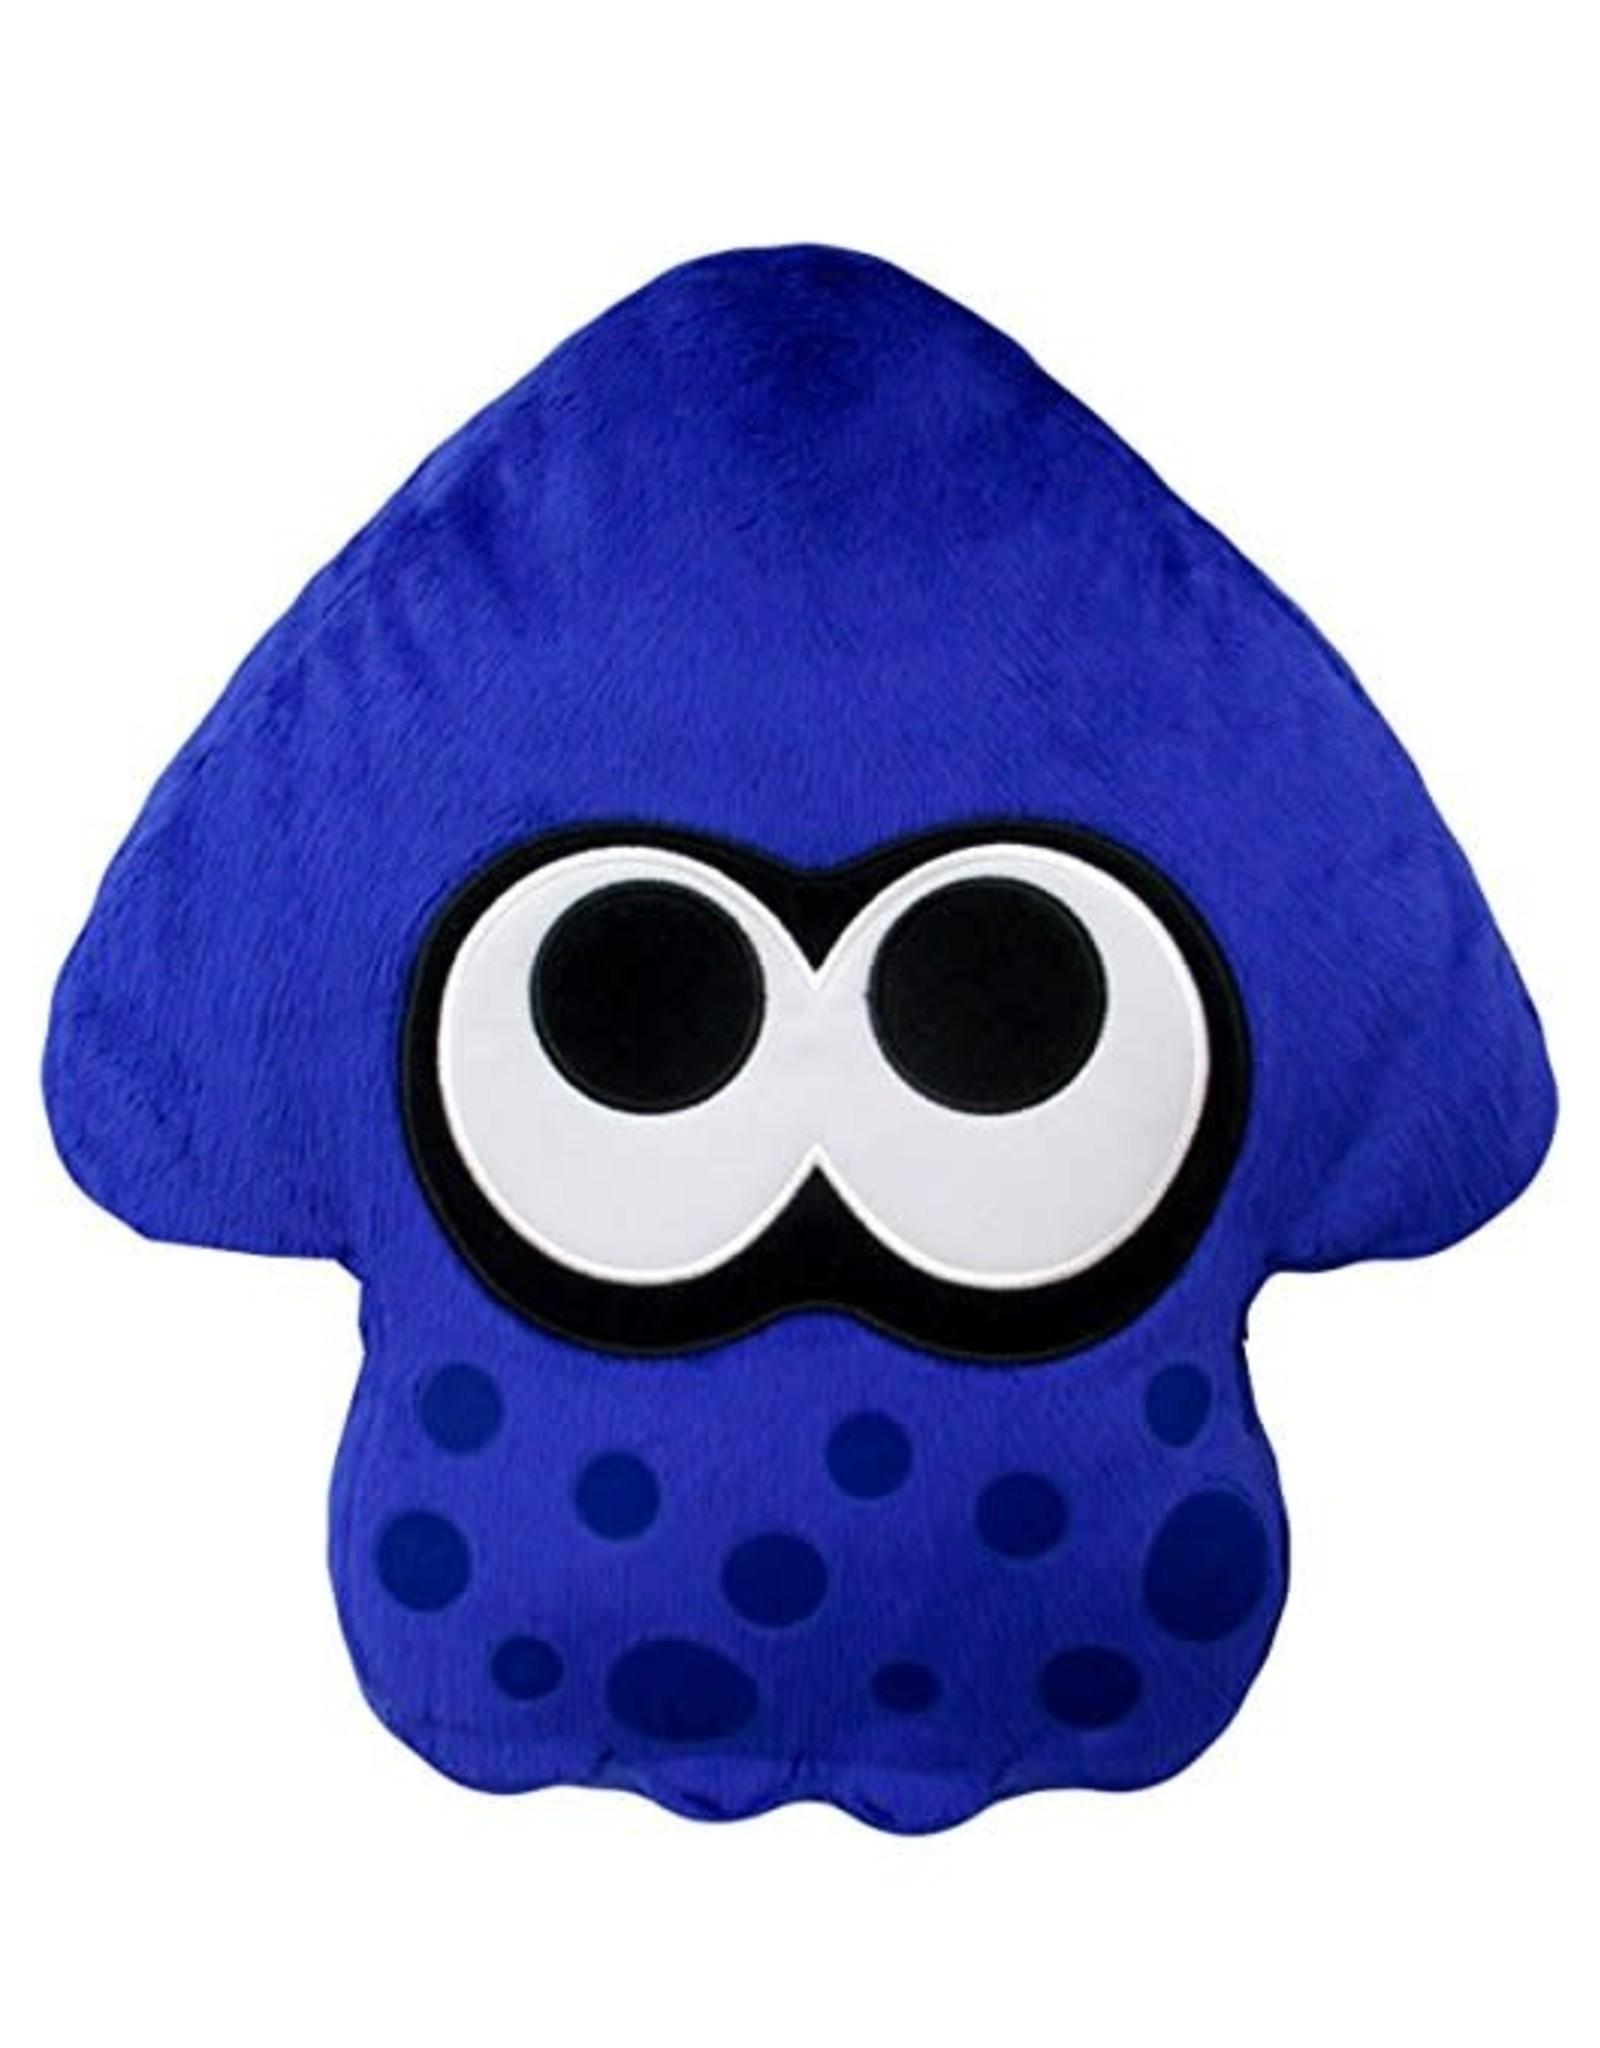 Splatoon 2: Bright Blue Pillow - 30cm x 30cm x 10cm